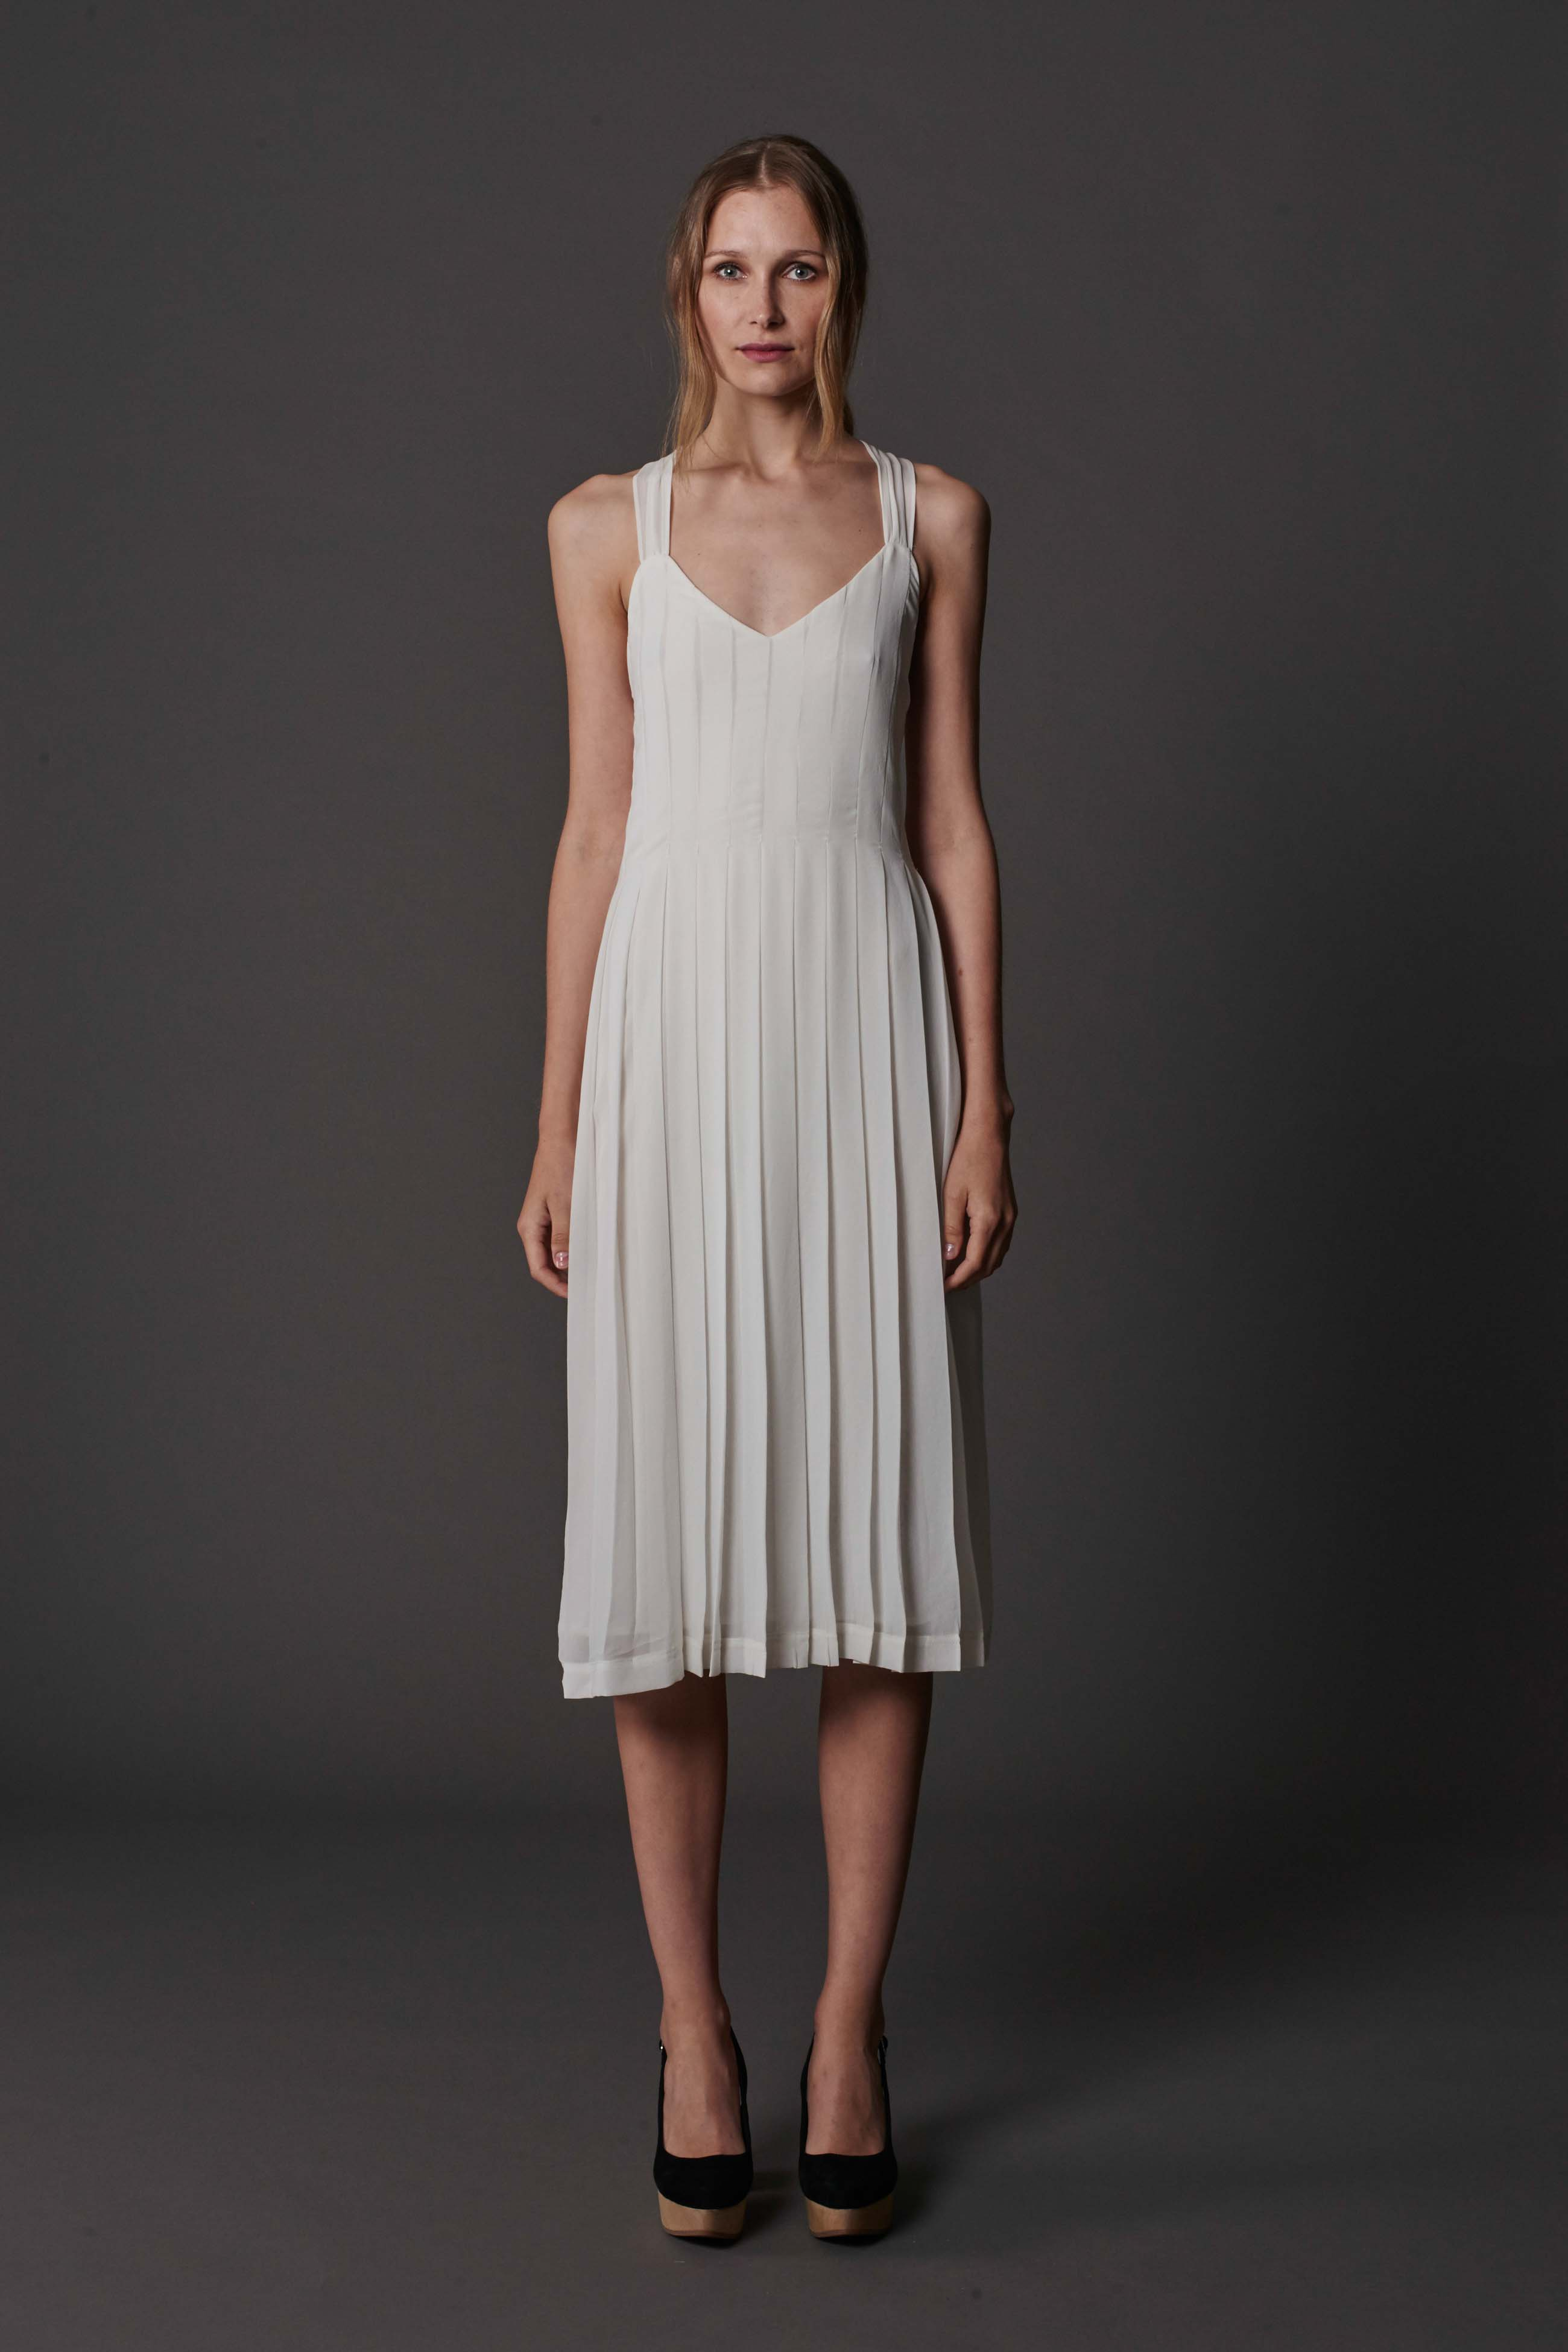 RUBY Lila Pleat Dress (ivory) & Halo Heel